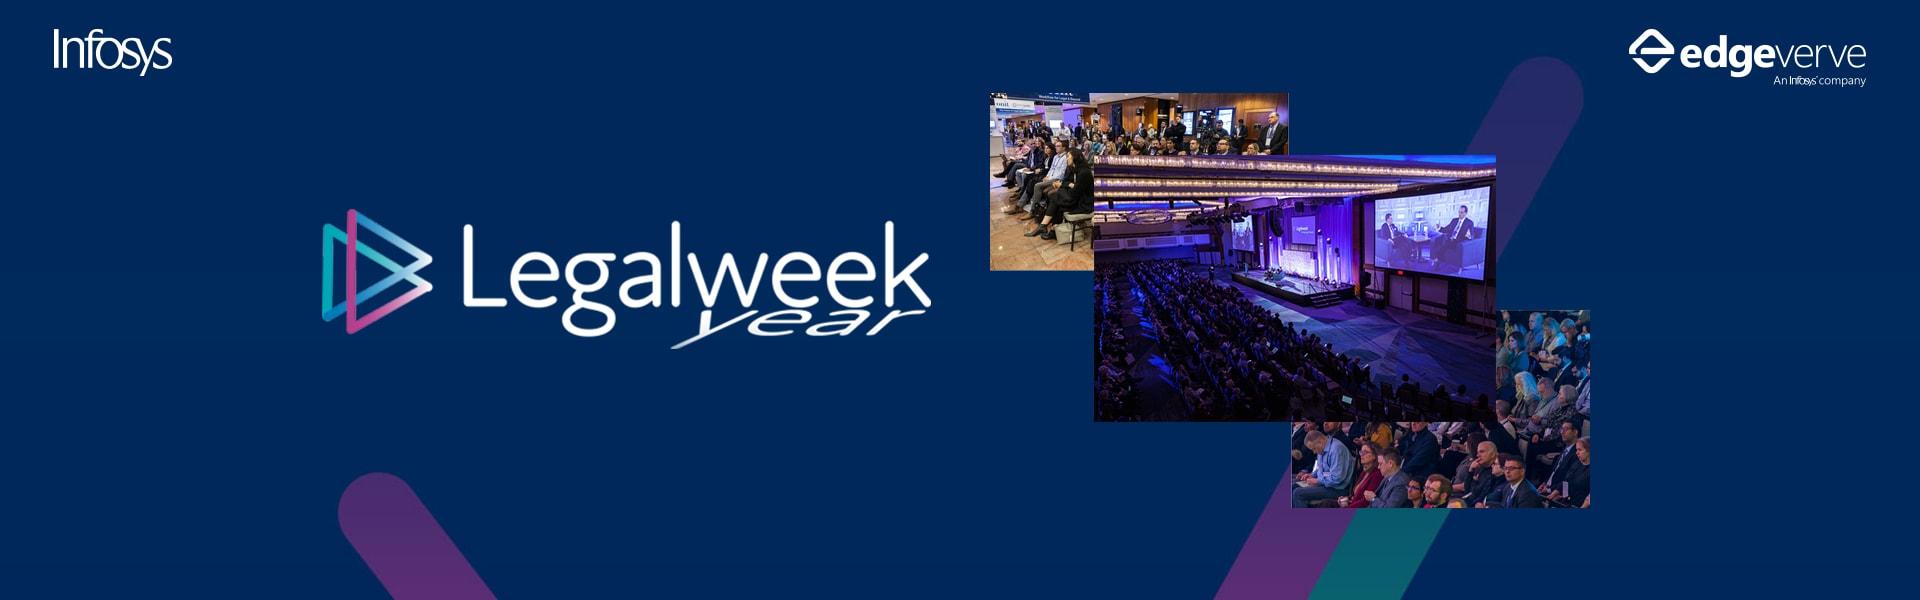 Legal-event-Week -bgs